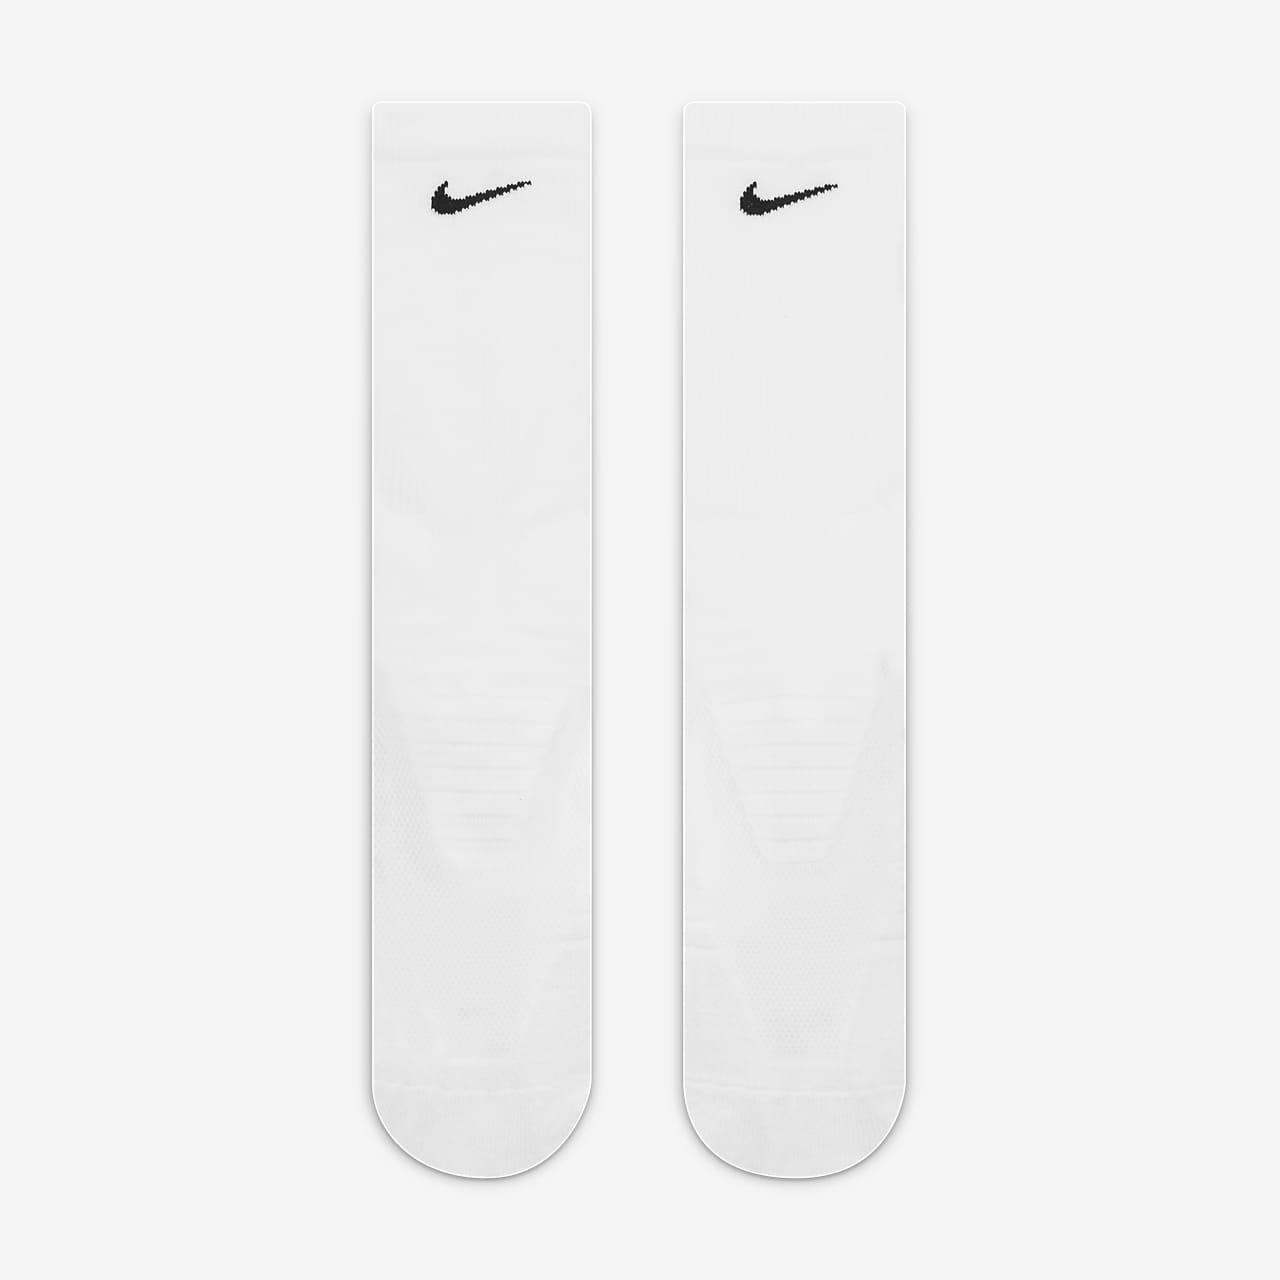 c4a646380 Nike Vapor Crew Men's Football Socks. Nike.com